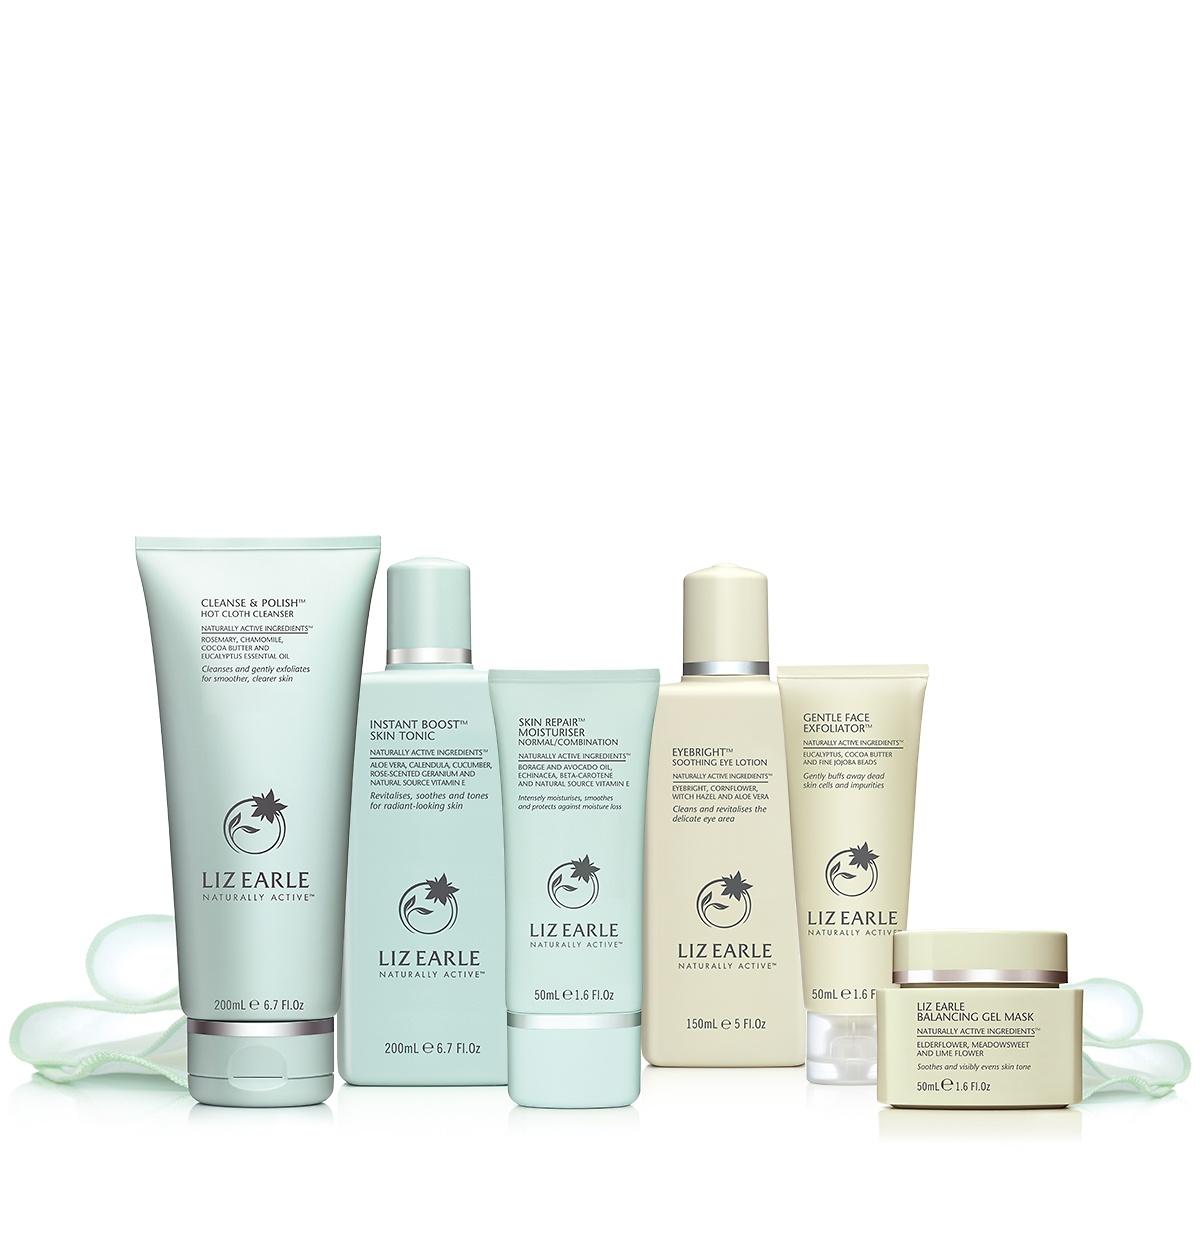 15% Off + FREE Cleanse, tone & moisturise travel size set @ Liz Earle e.g Daily Routine Set £41.65 + Free Gifts worth £47 + Free Travel Set